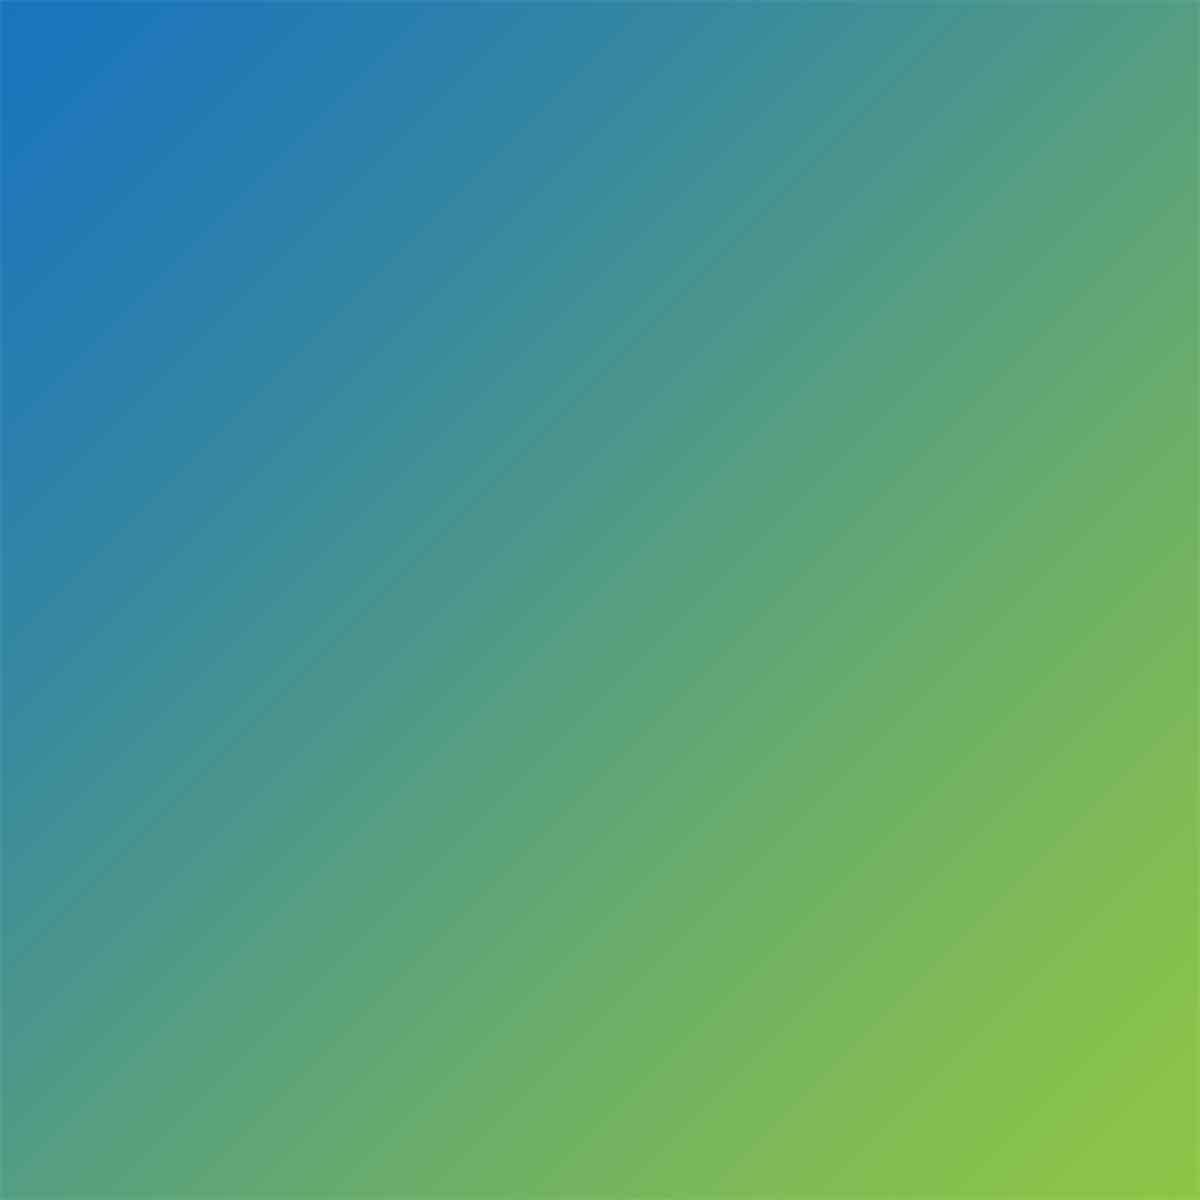 https://tinatours.bg/wp-content/uploads/2018/09/bgn-image-box-gradient.jpg